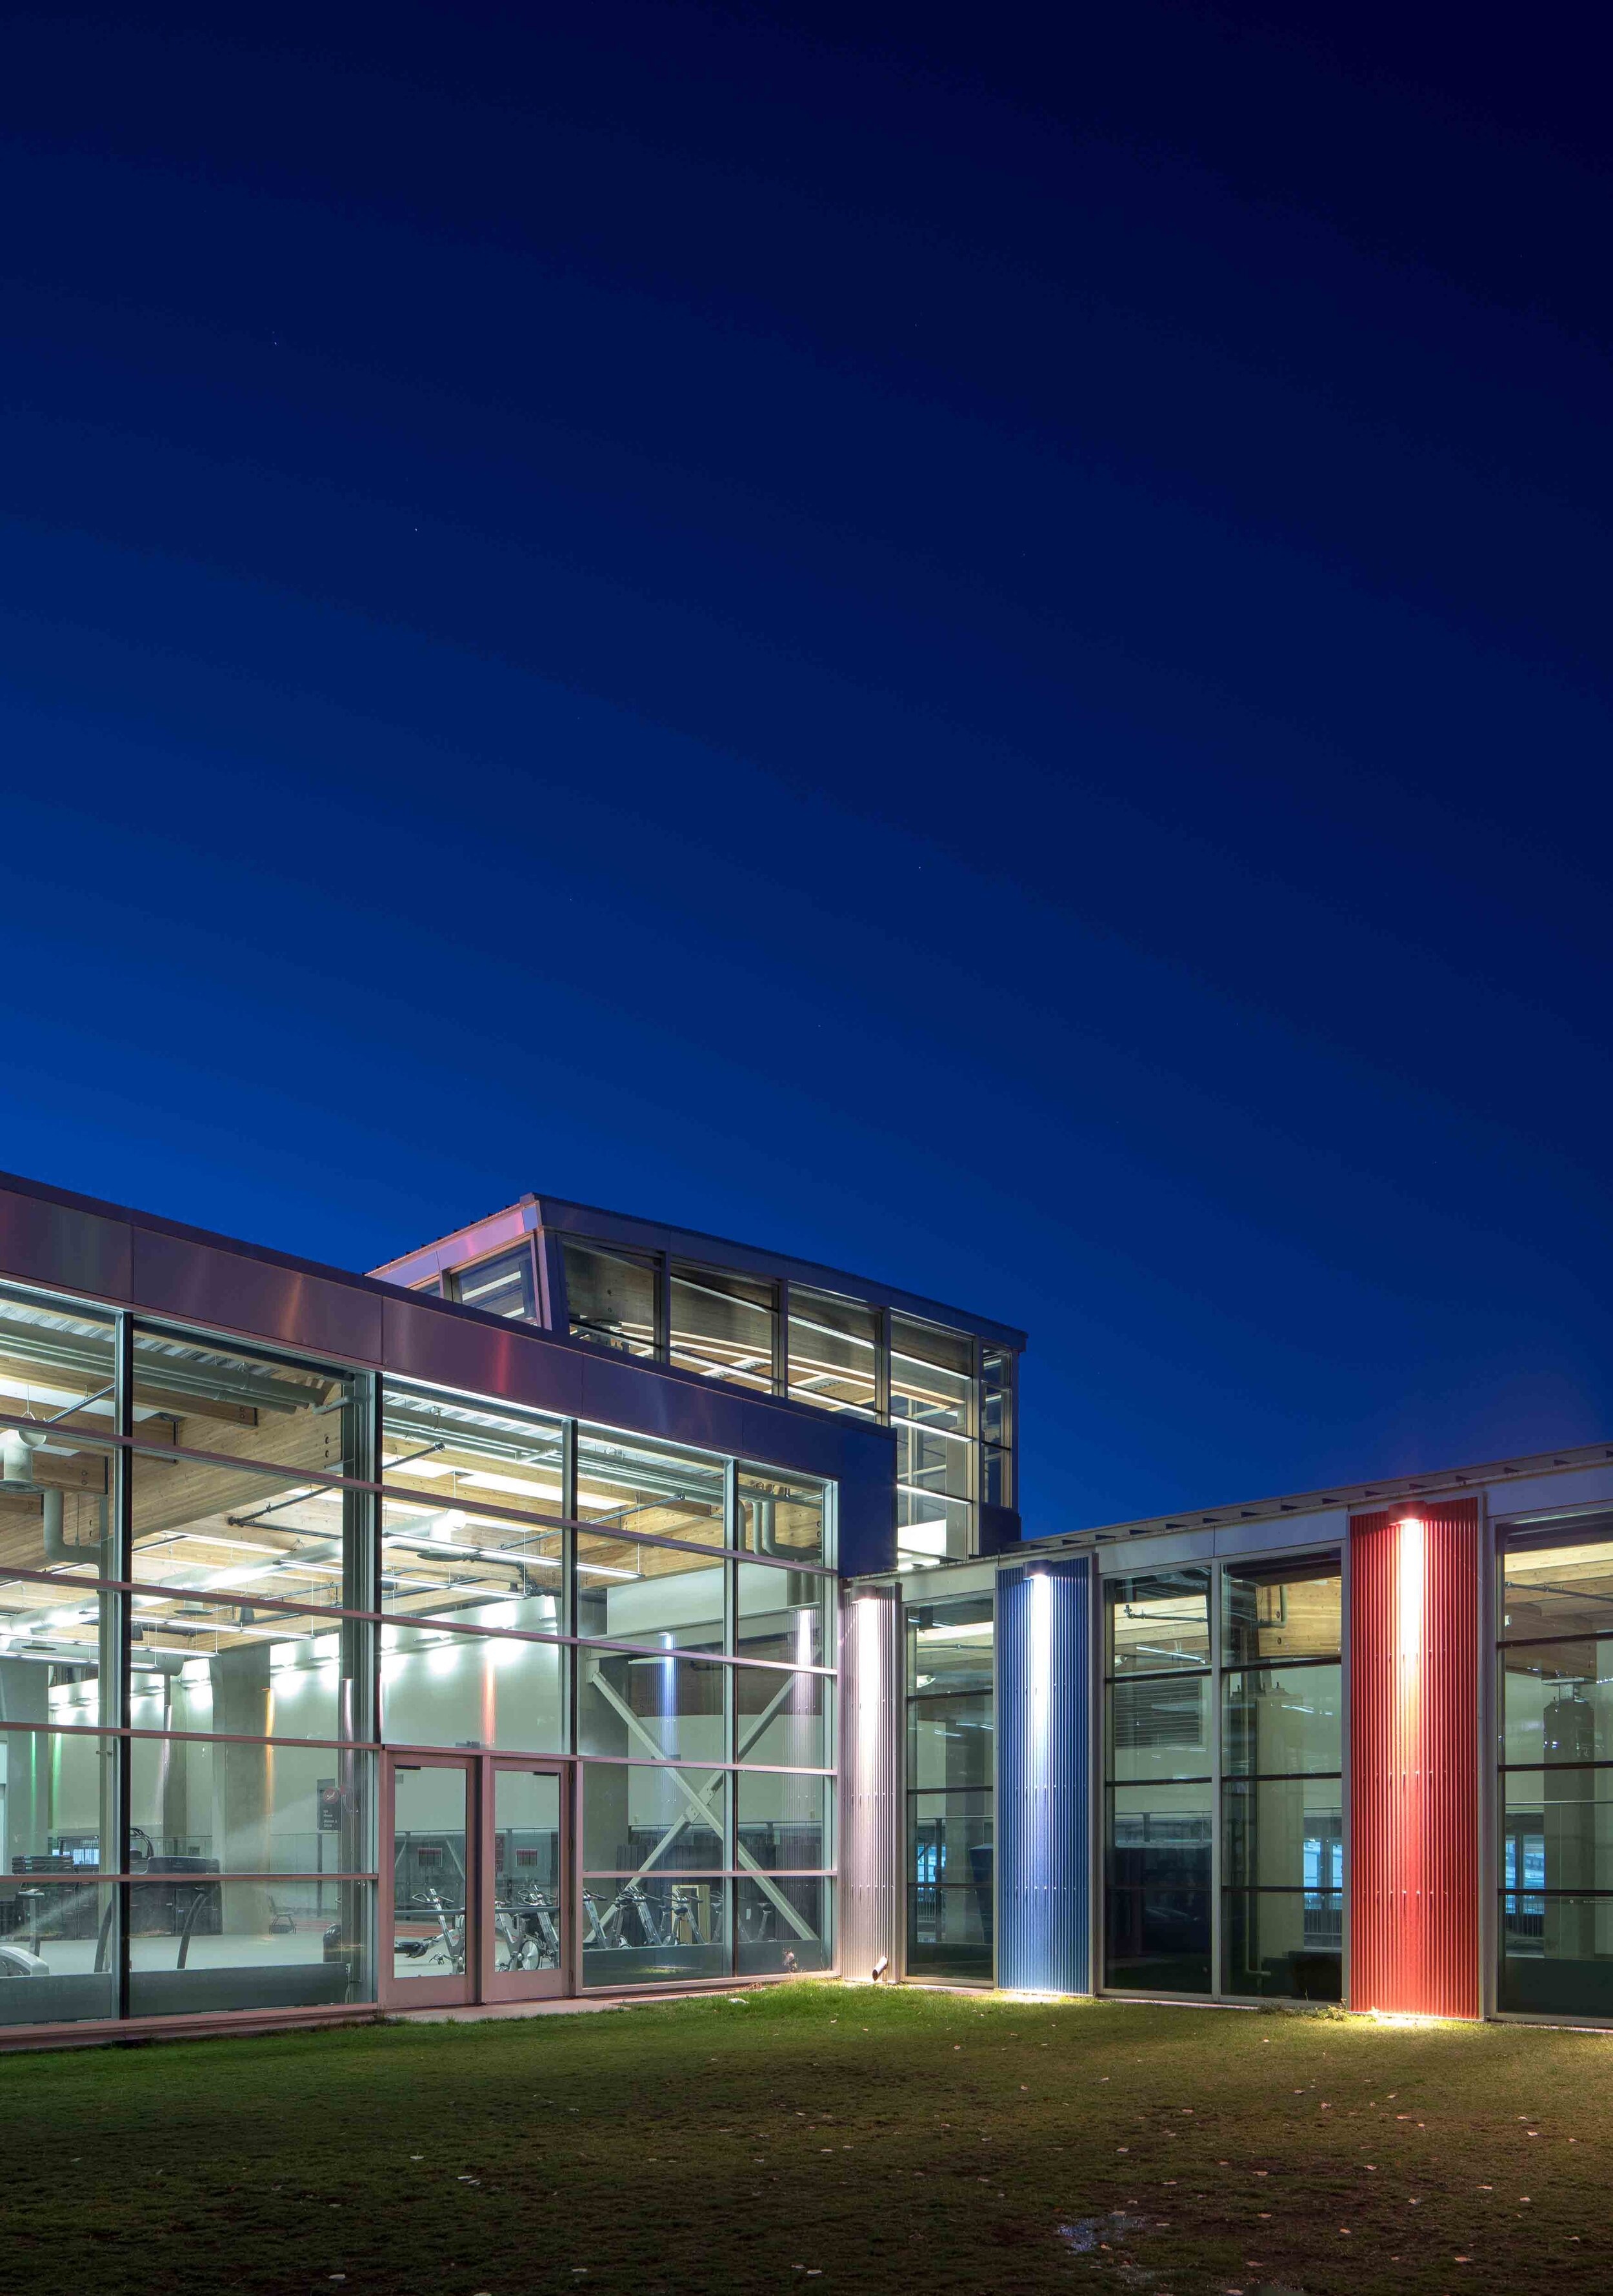 WinSport's Markin MacPhail Centre